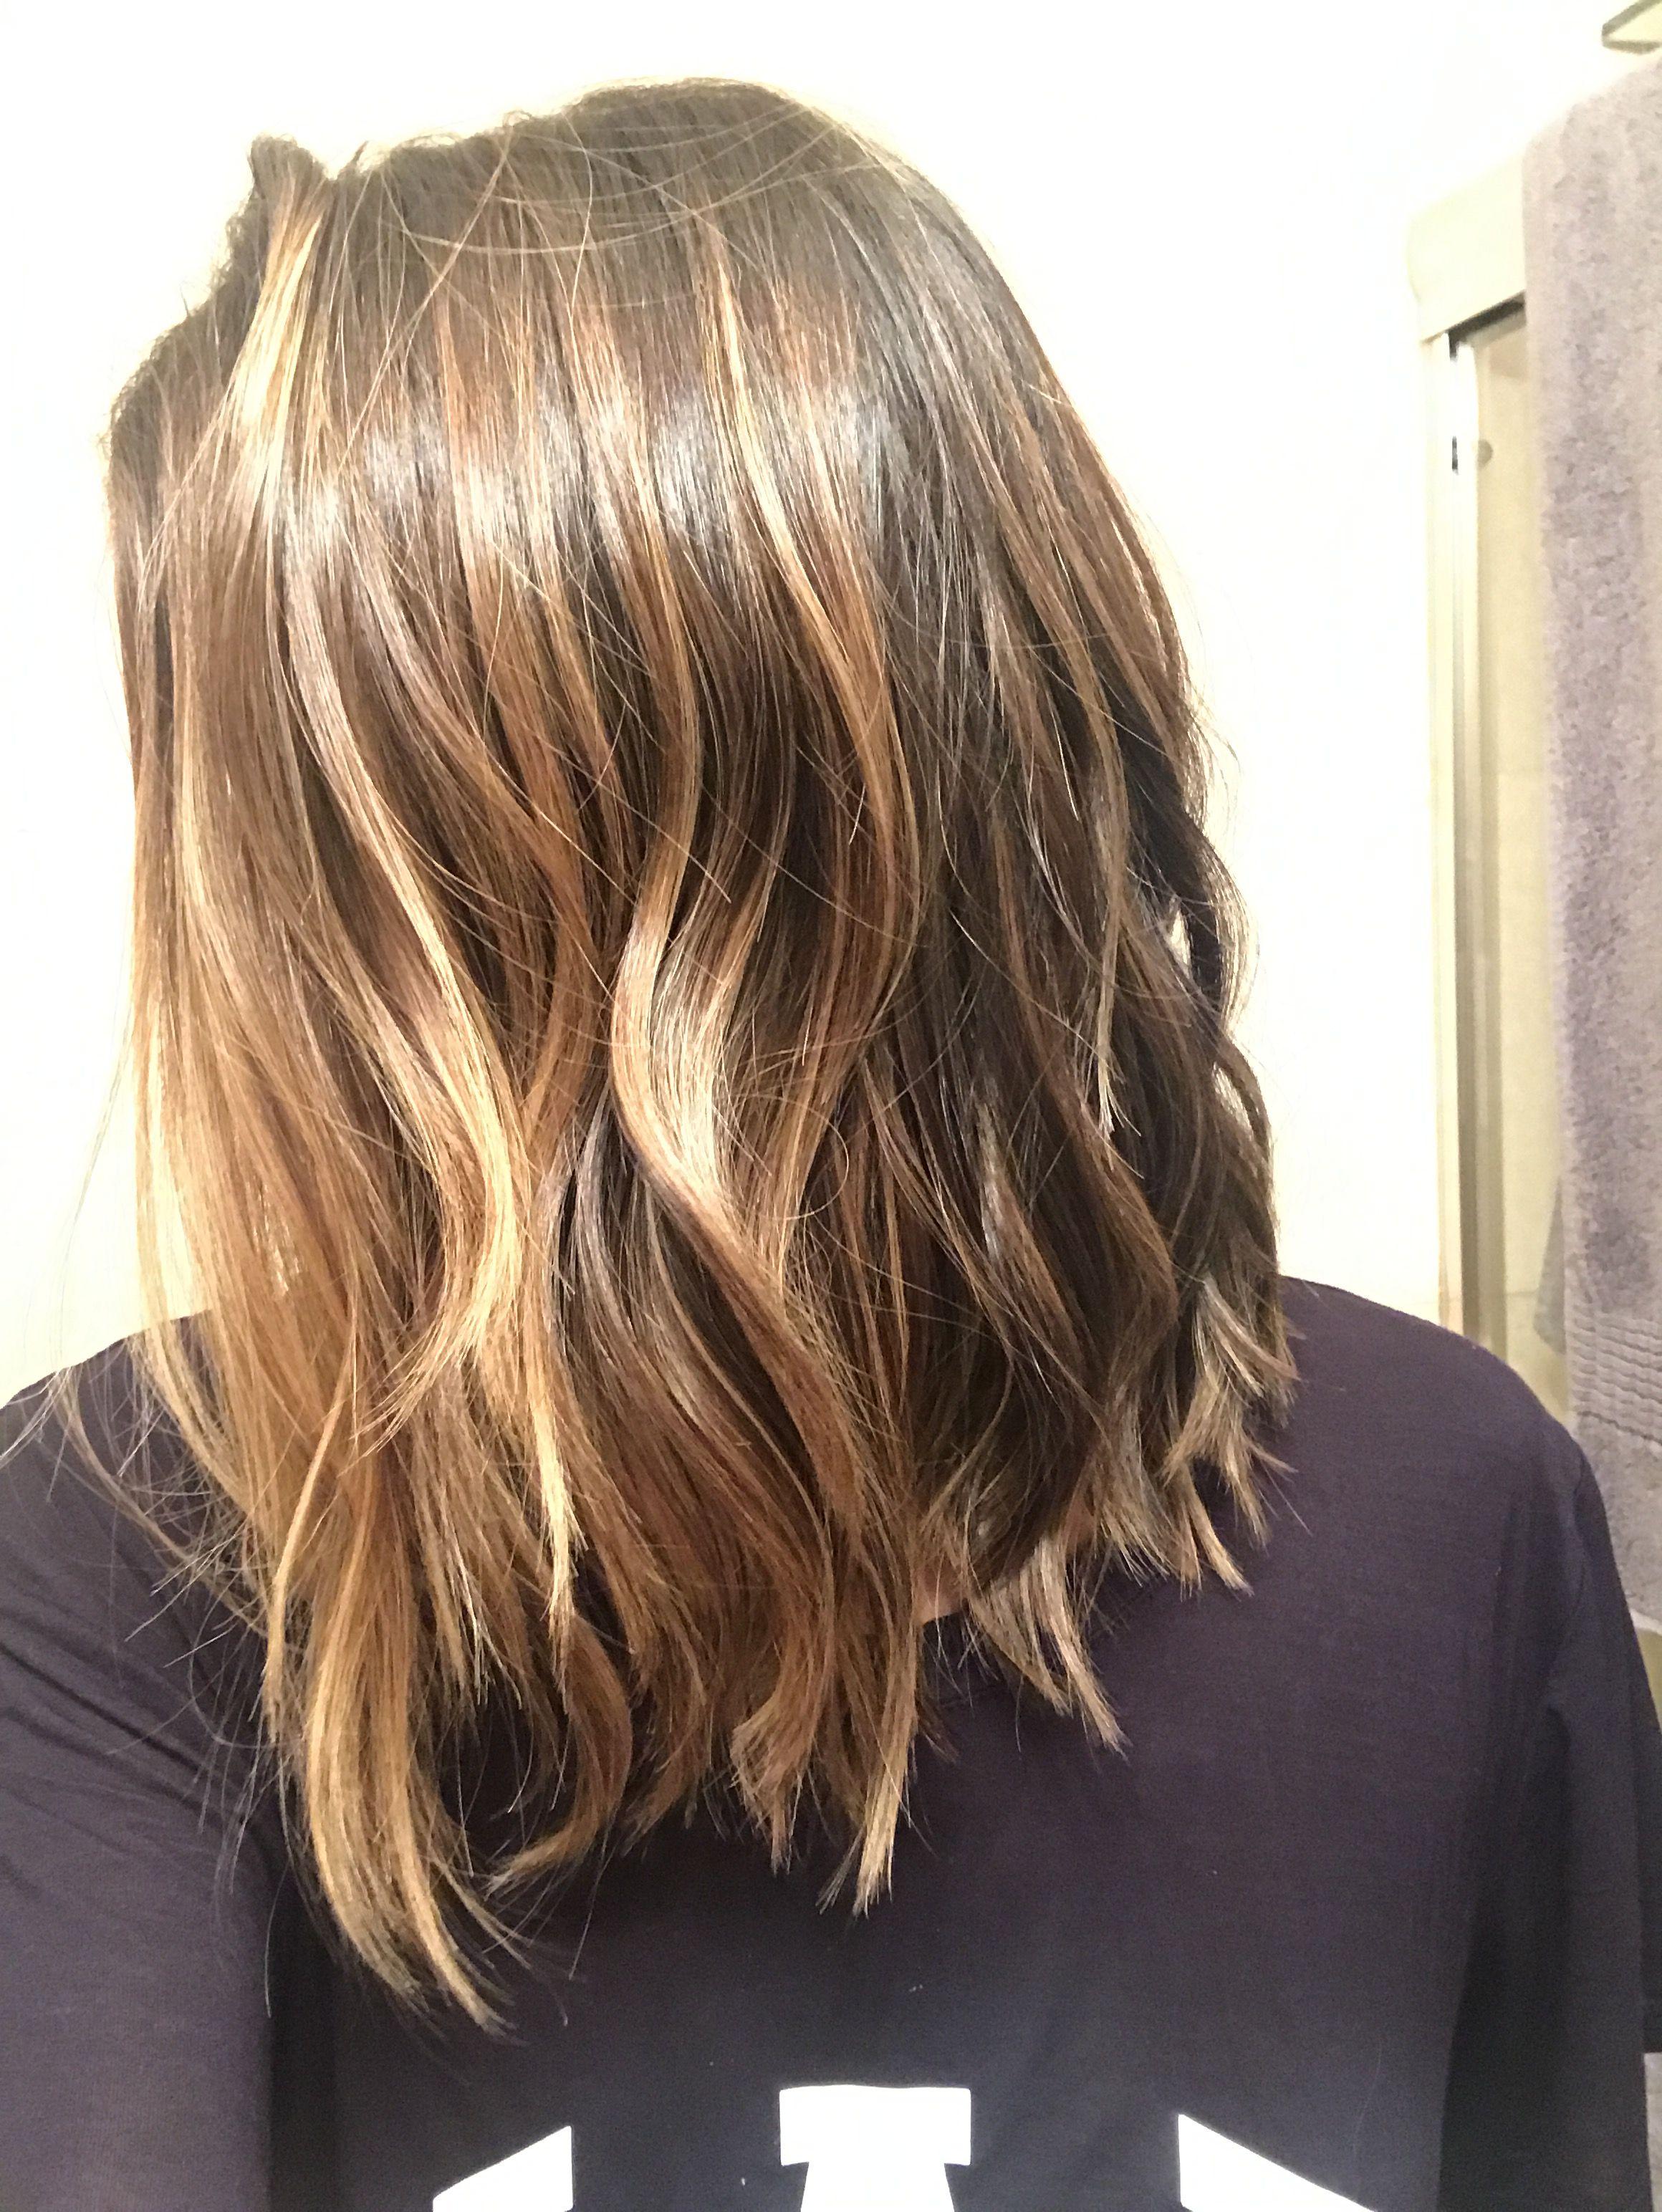 Balayage Hair By Kimberly Pierce Nyc All Haired Up